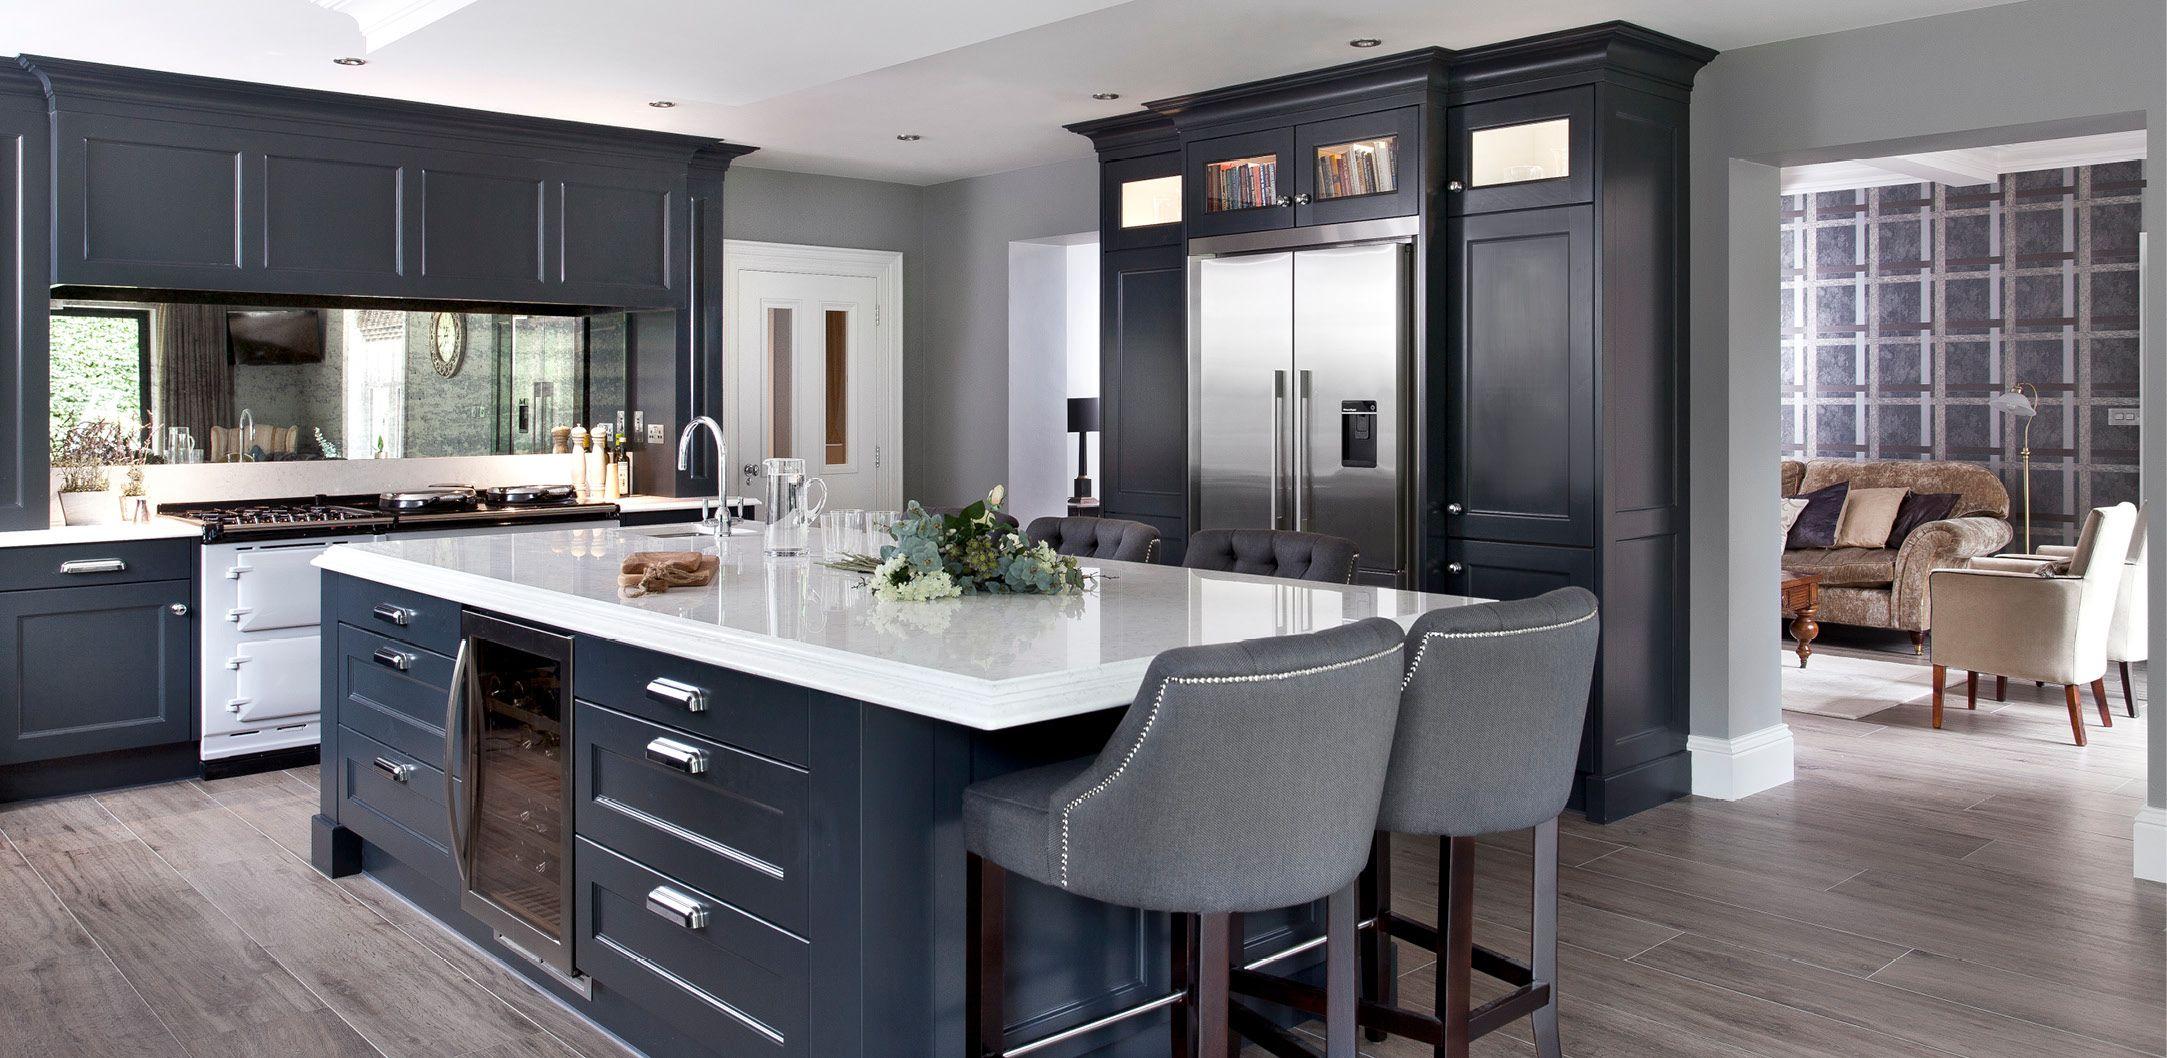 Modern Classic Kitchen, Omagh3 Classic kitchen design